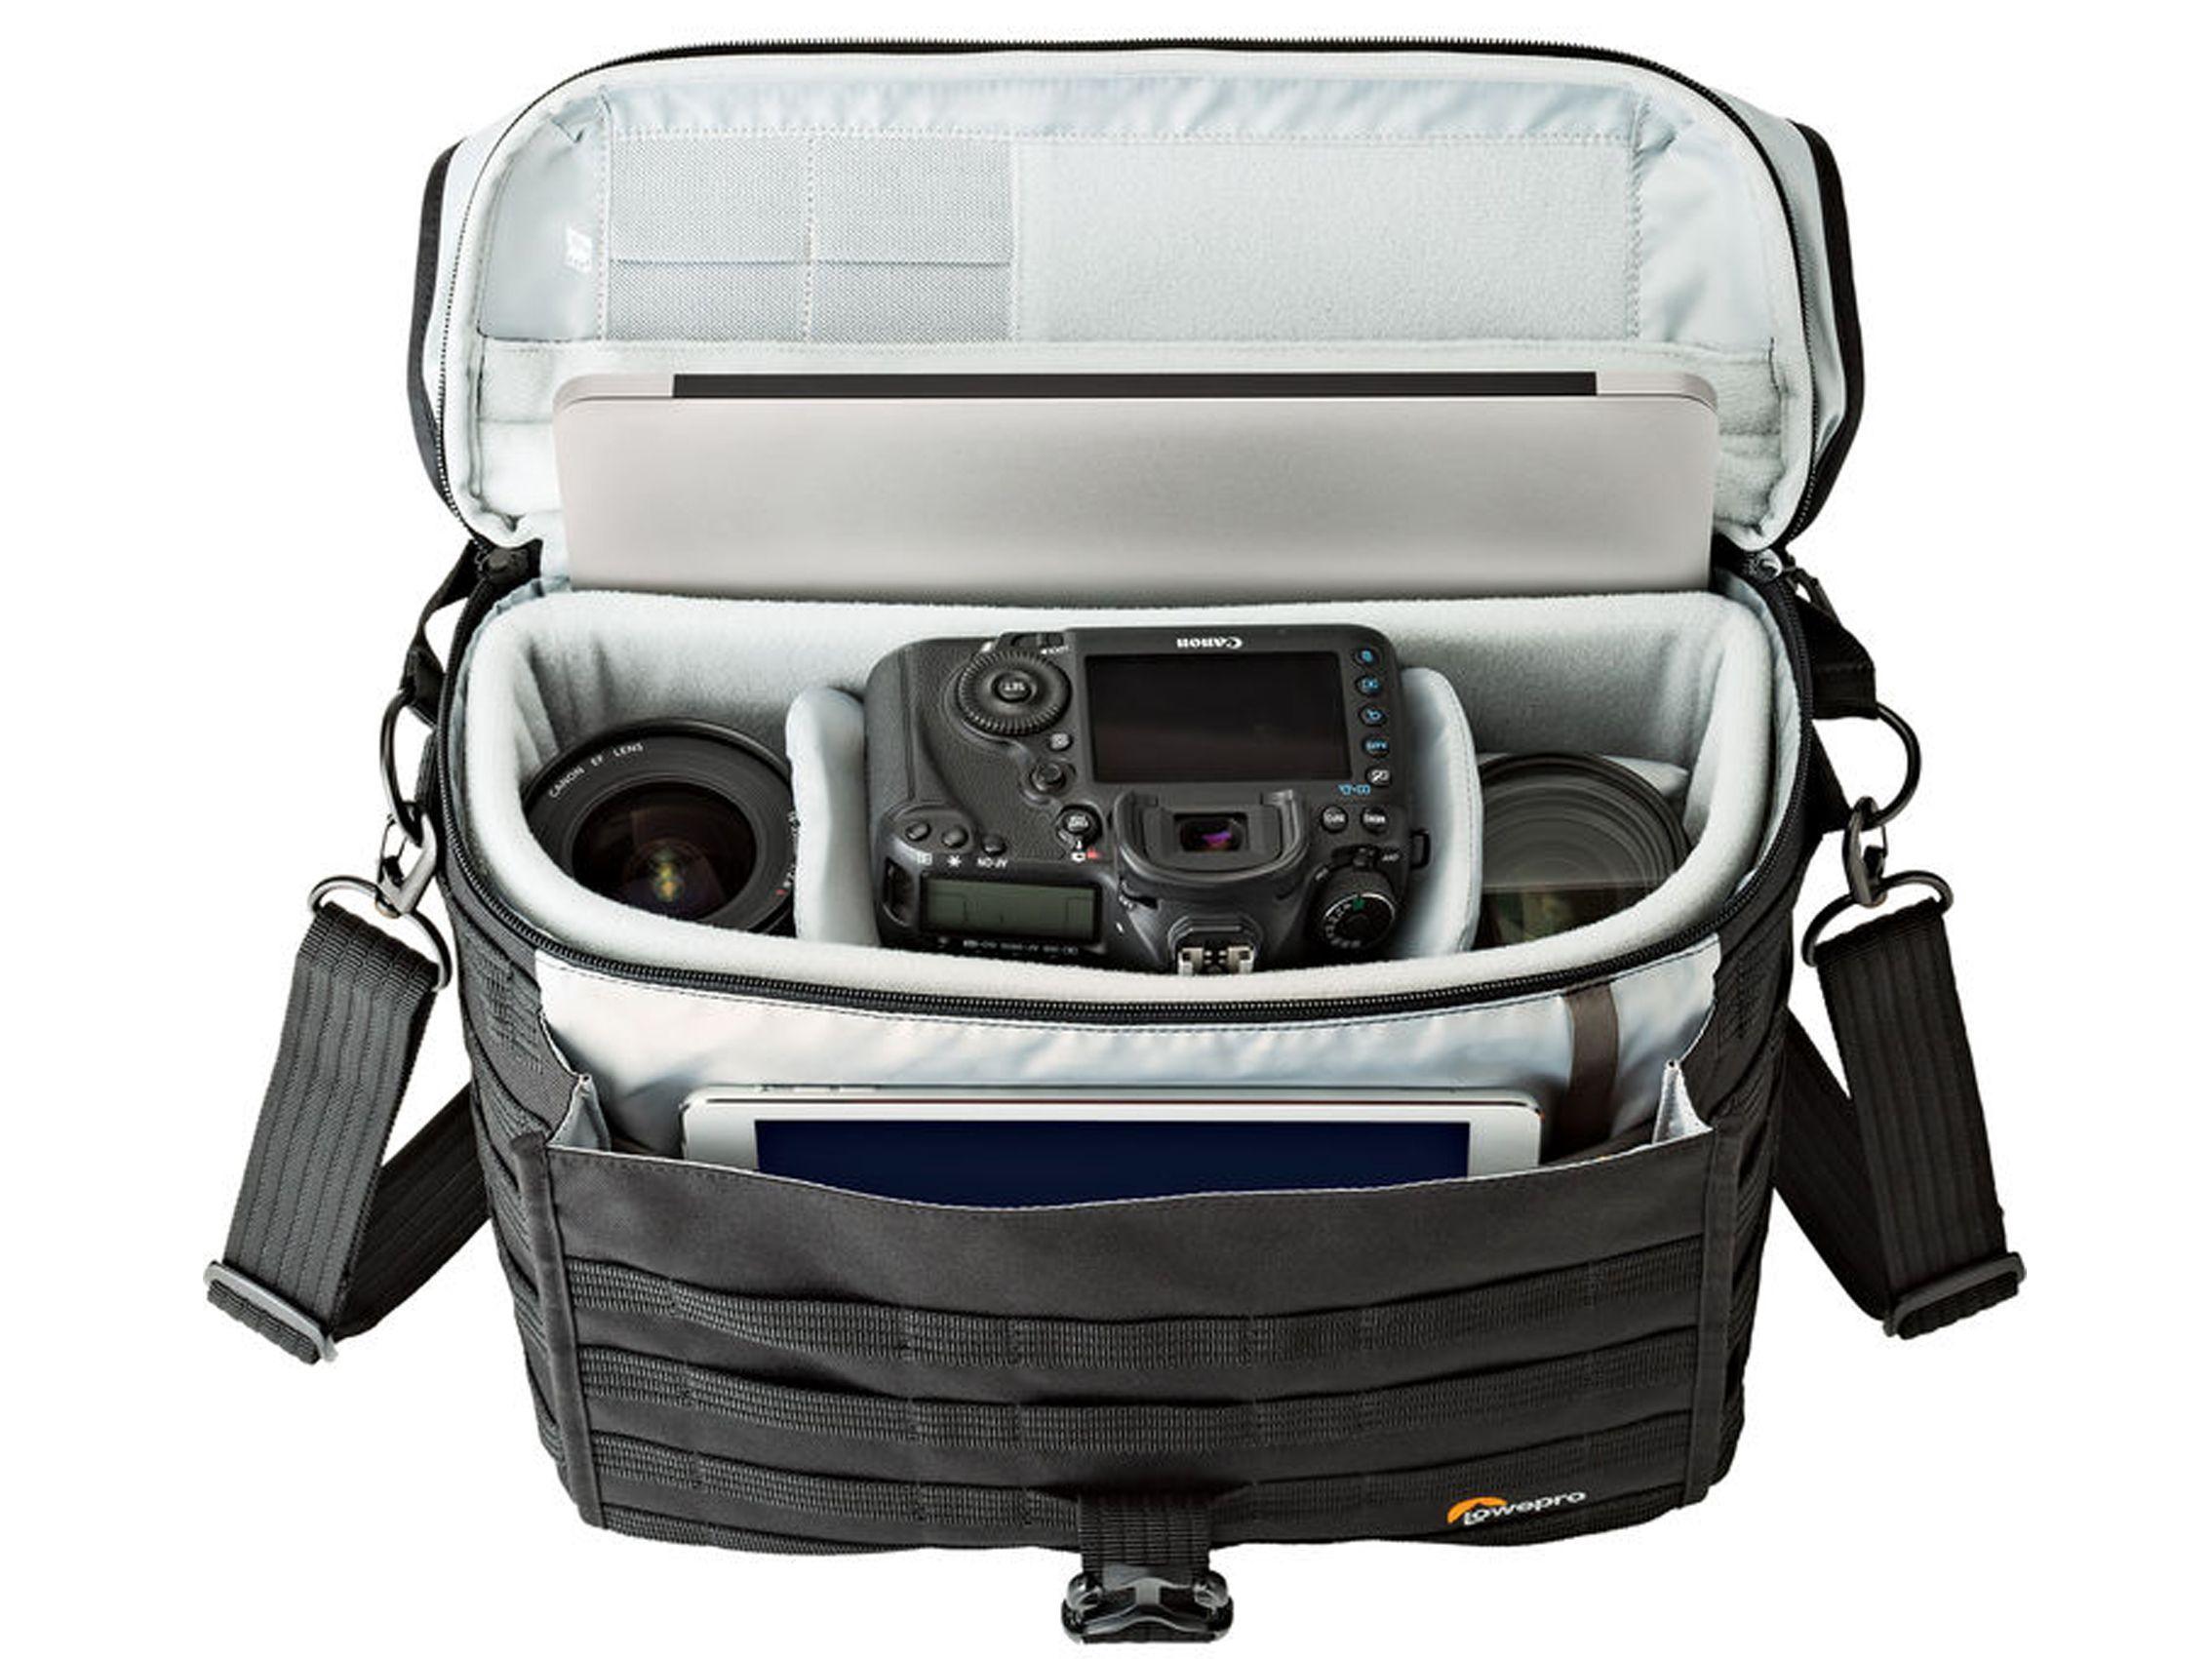 Lowepro ProTactic SH 200 AW Camera Shoulder Bag